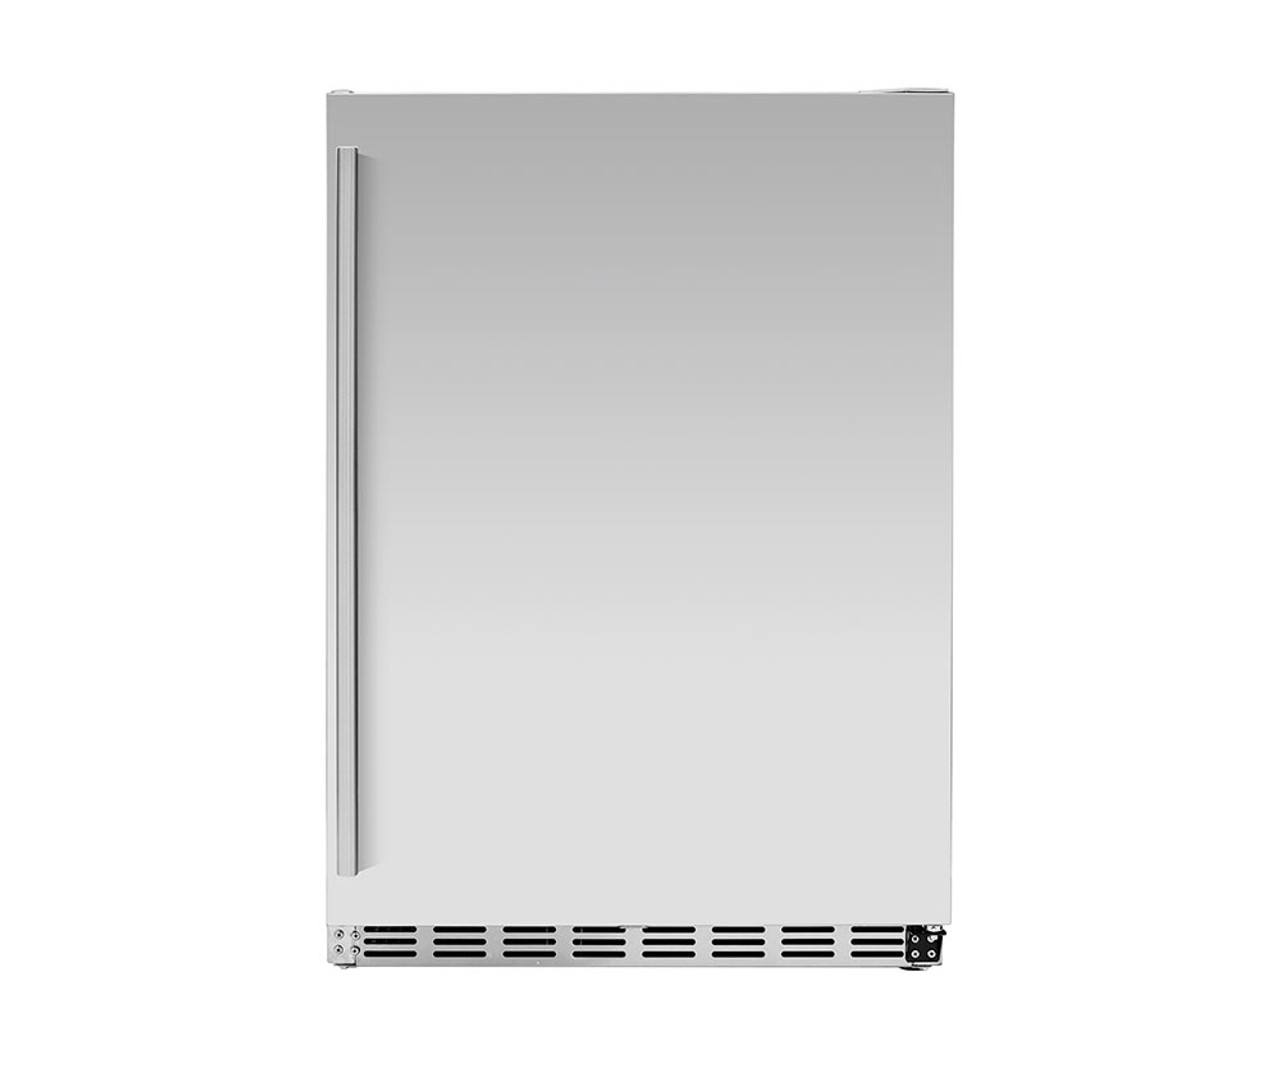 New Summerset UL Refrigerator 5.3 ft3 - SSRFR-S3